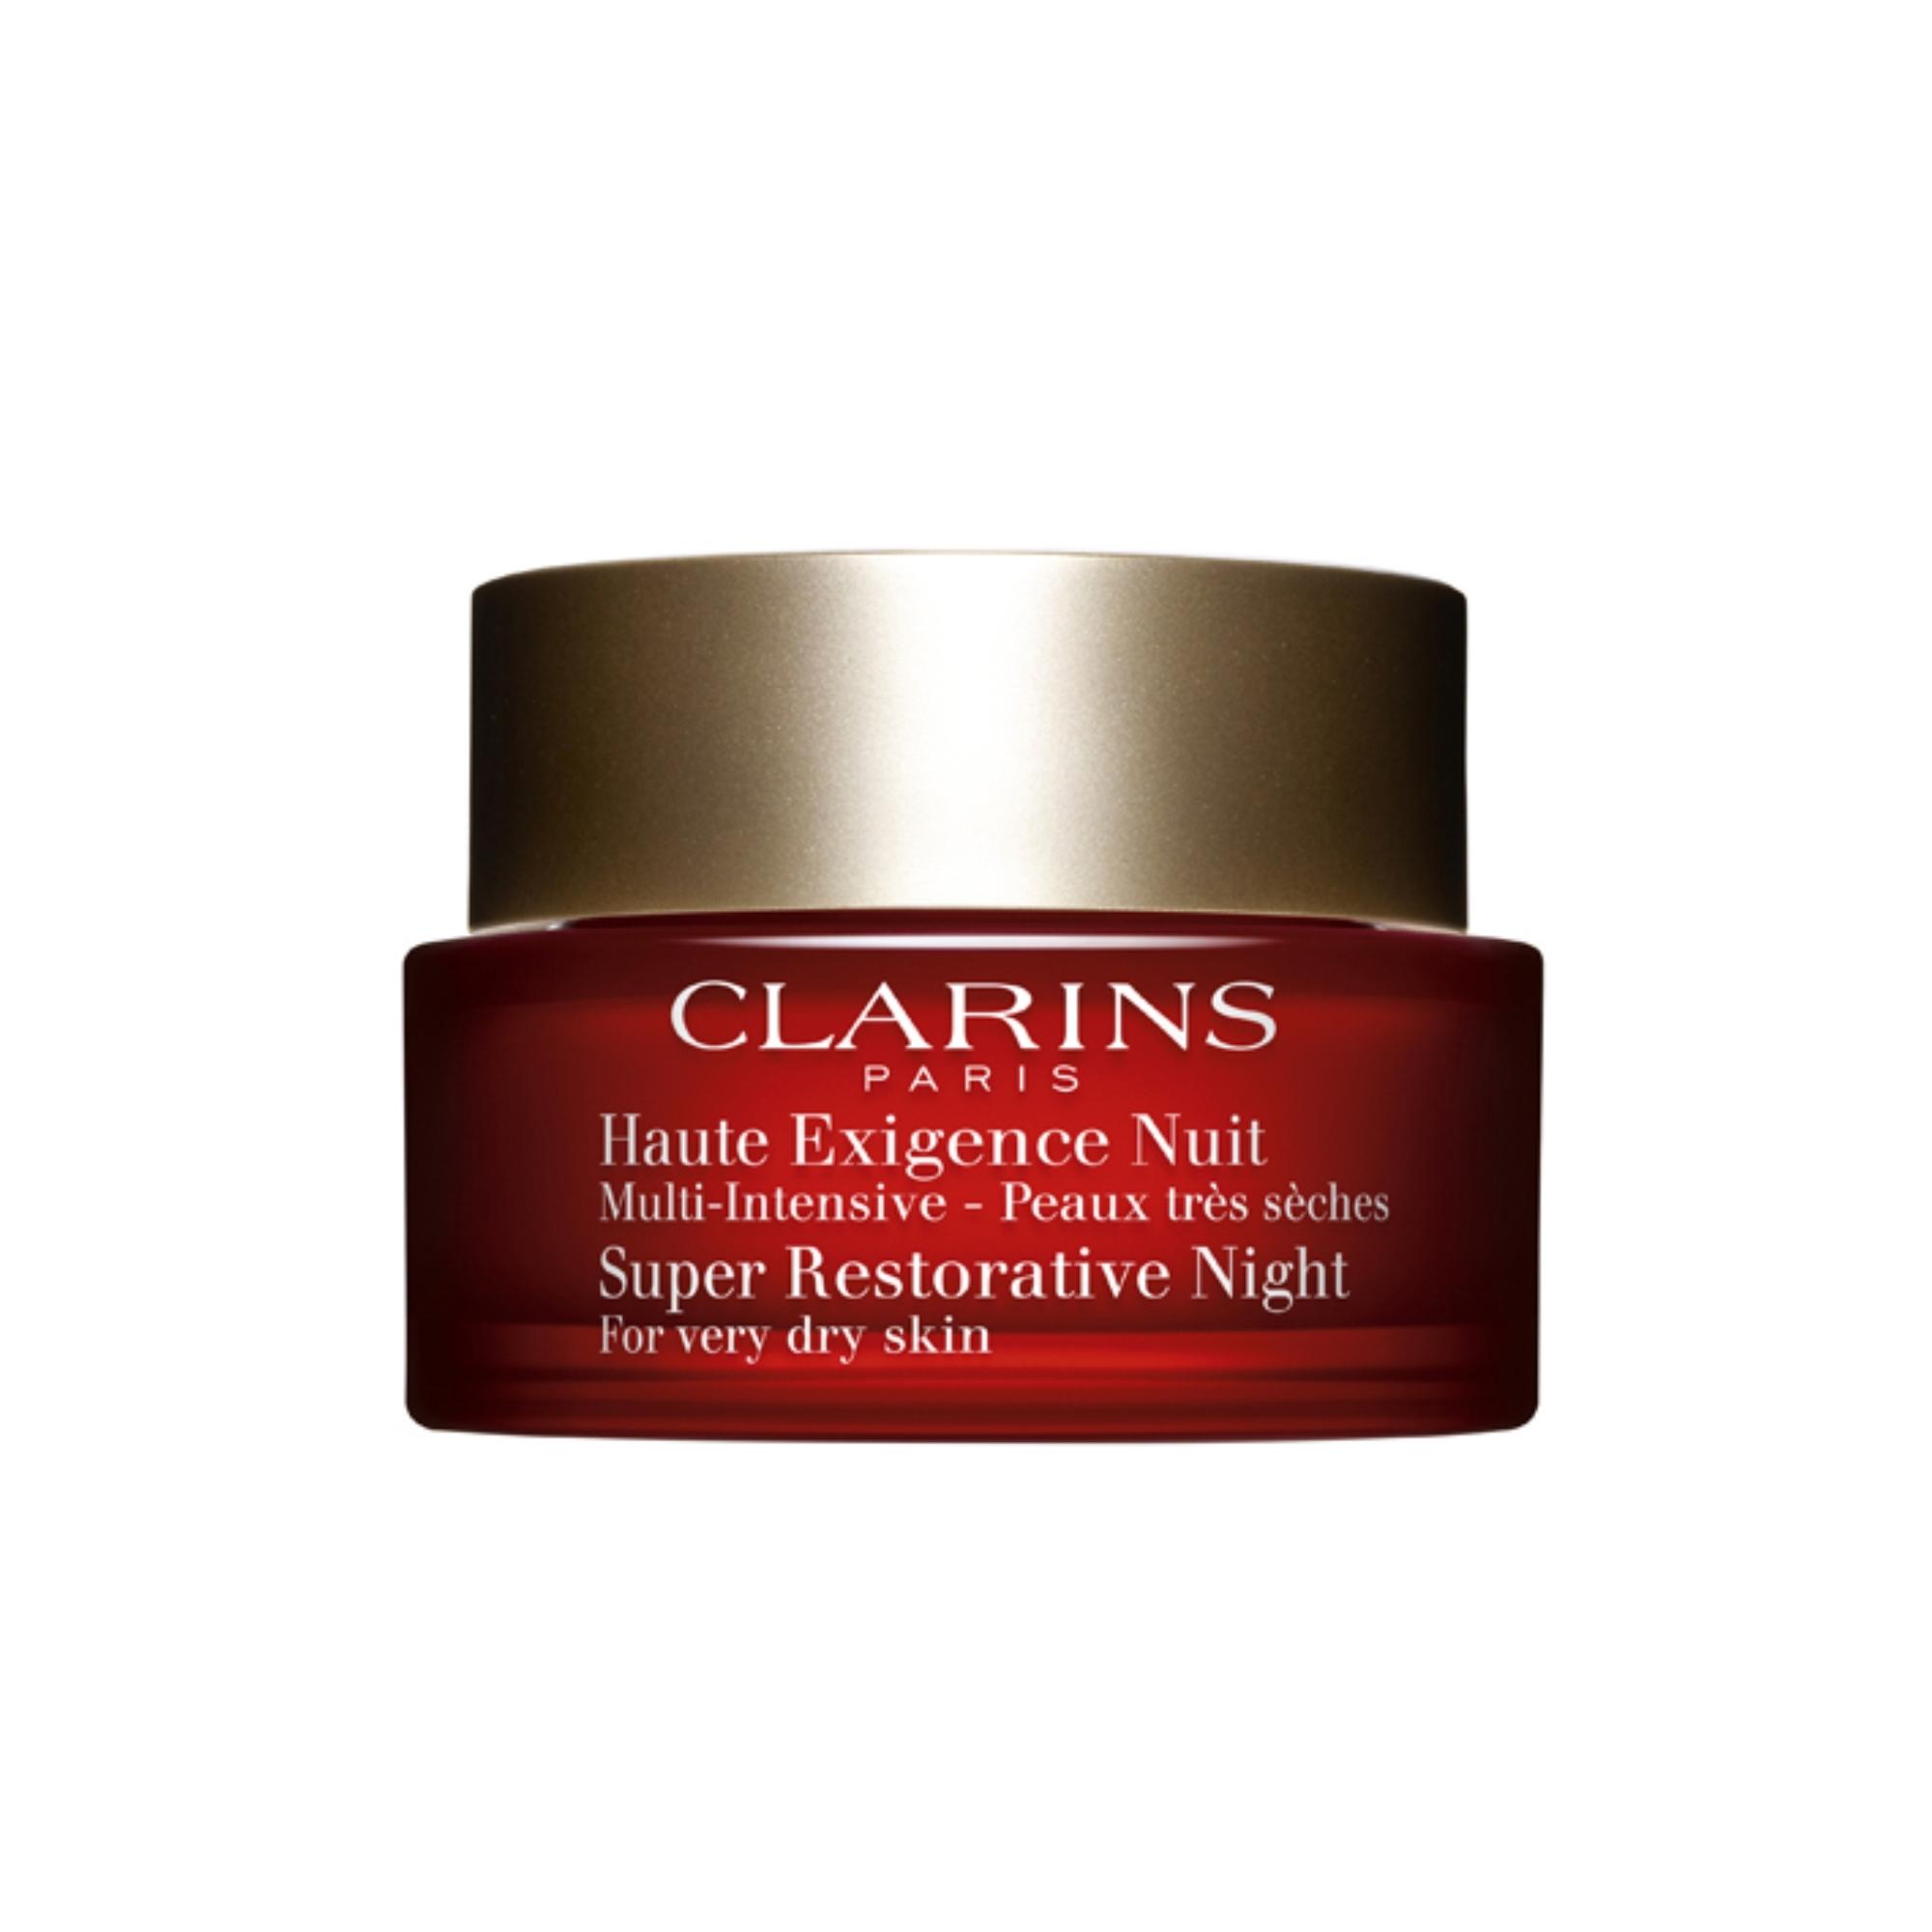 Super Restorative Night Cream for Very Dry Skin